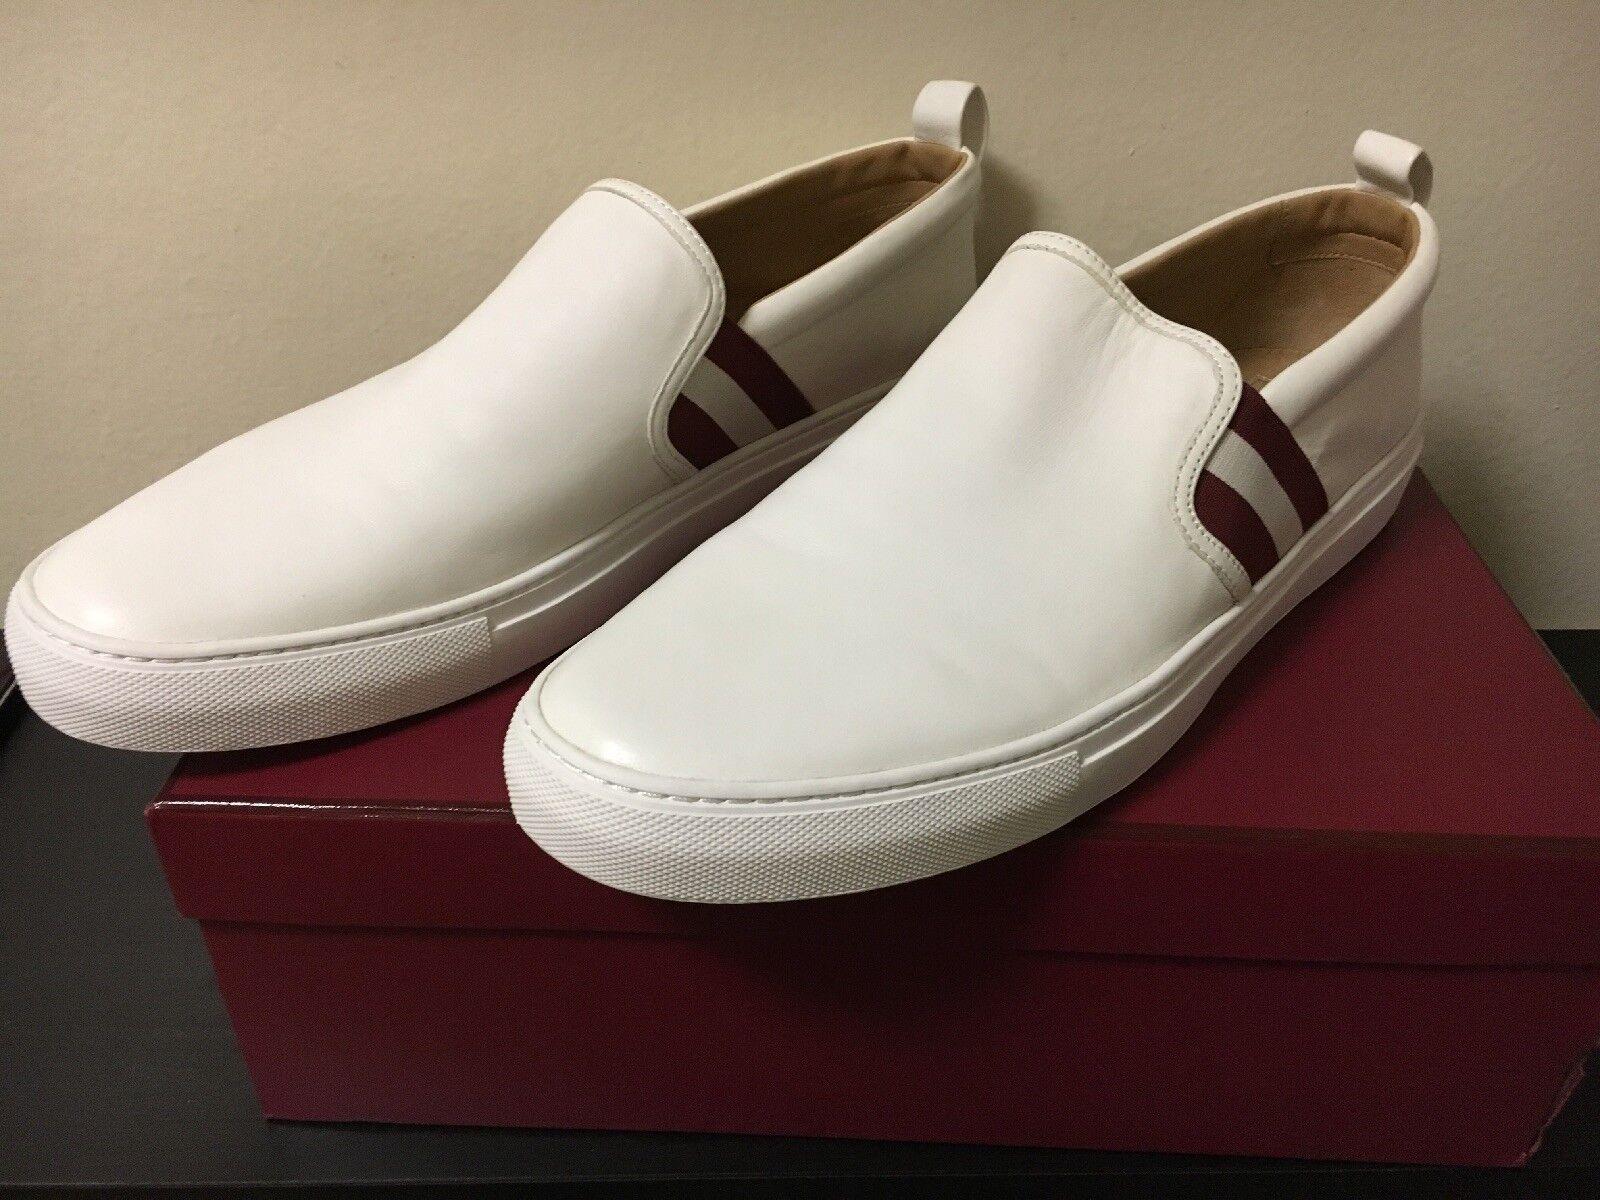 New Bally Men's Herald 200 bianca Nappa Lamb Leather Loafer scarpe Dimensione 12.5 US